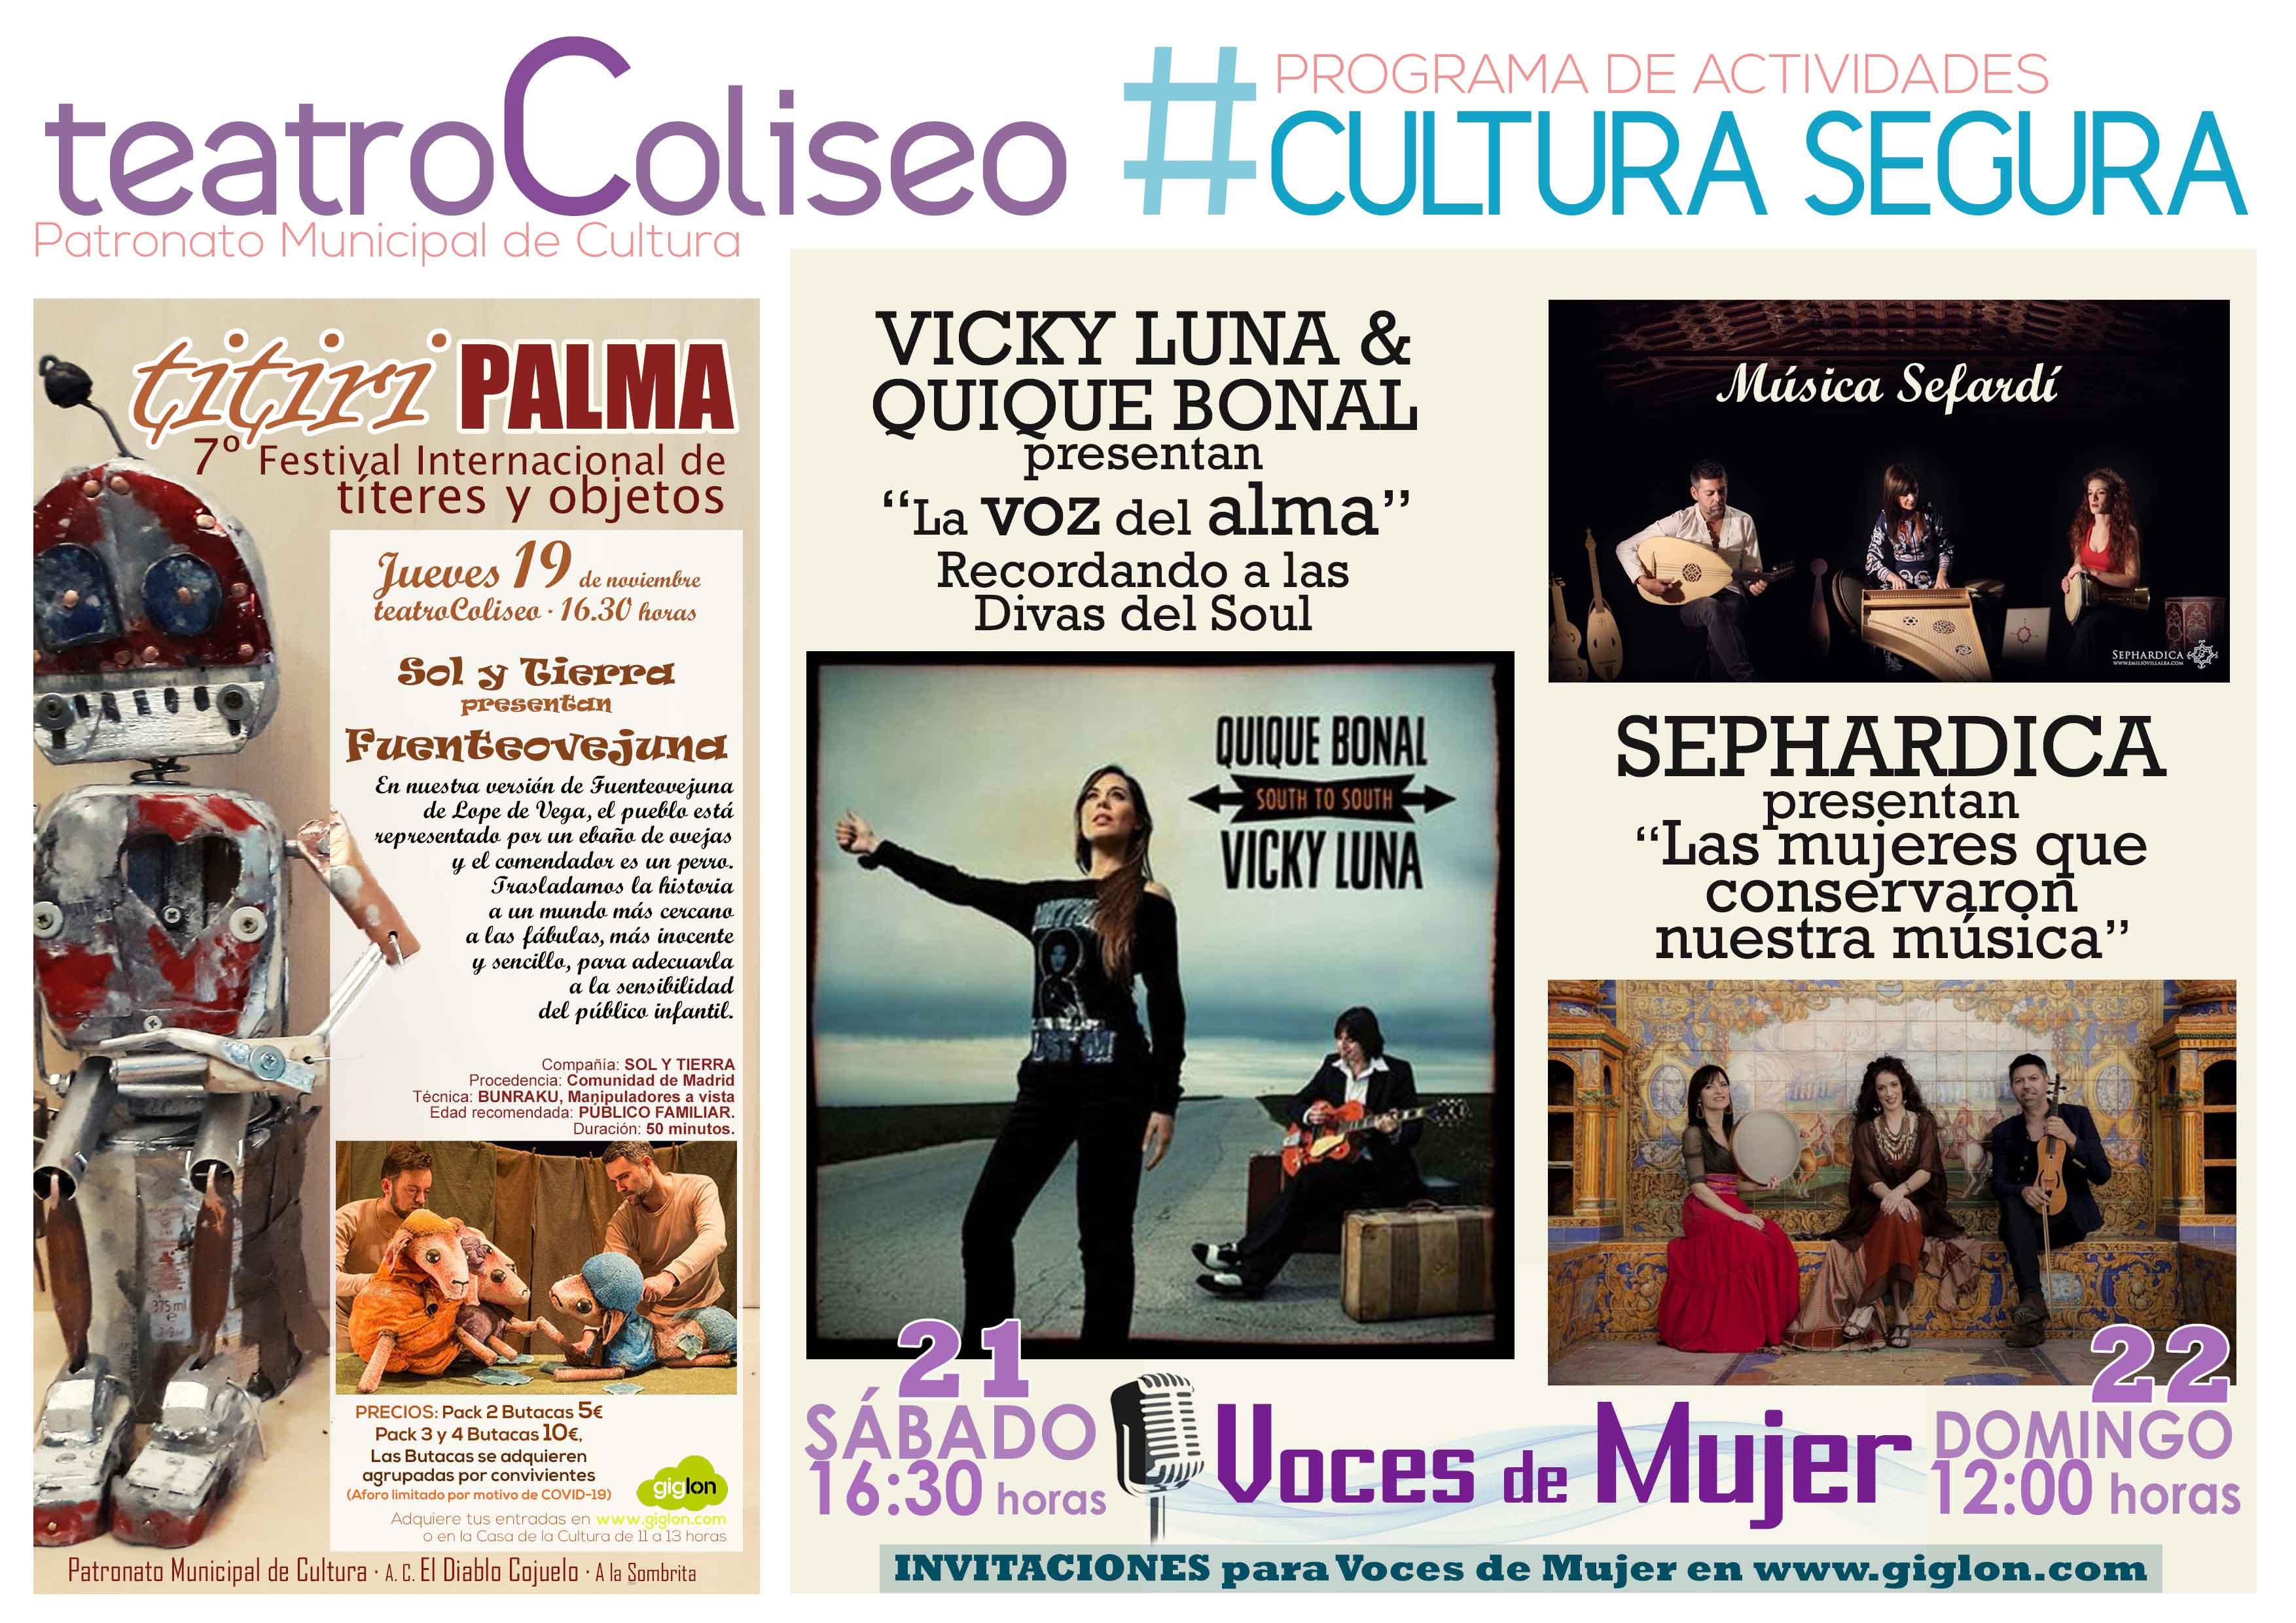 https://www.palmadelrio.es/sites/default/files/cultura-segura-19-22-nov.jpg